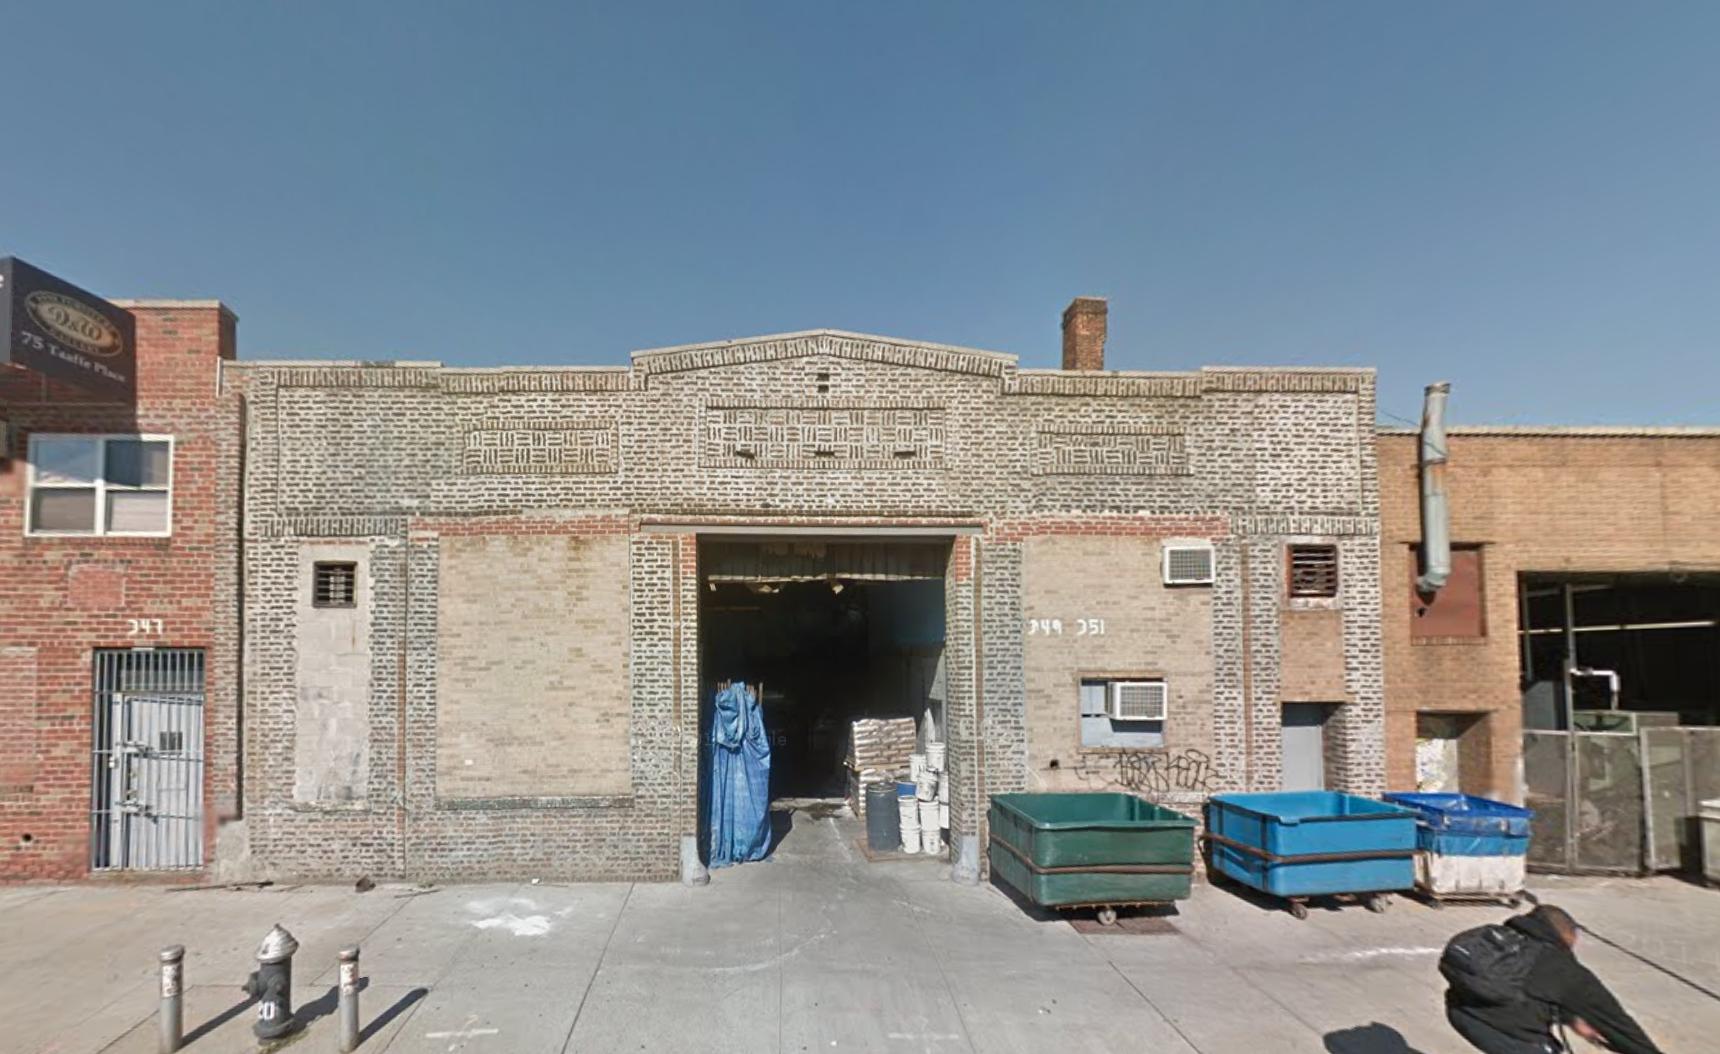 347 Flushing Avenue, image via Google Maps